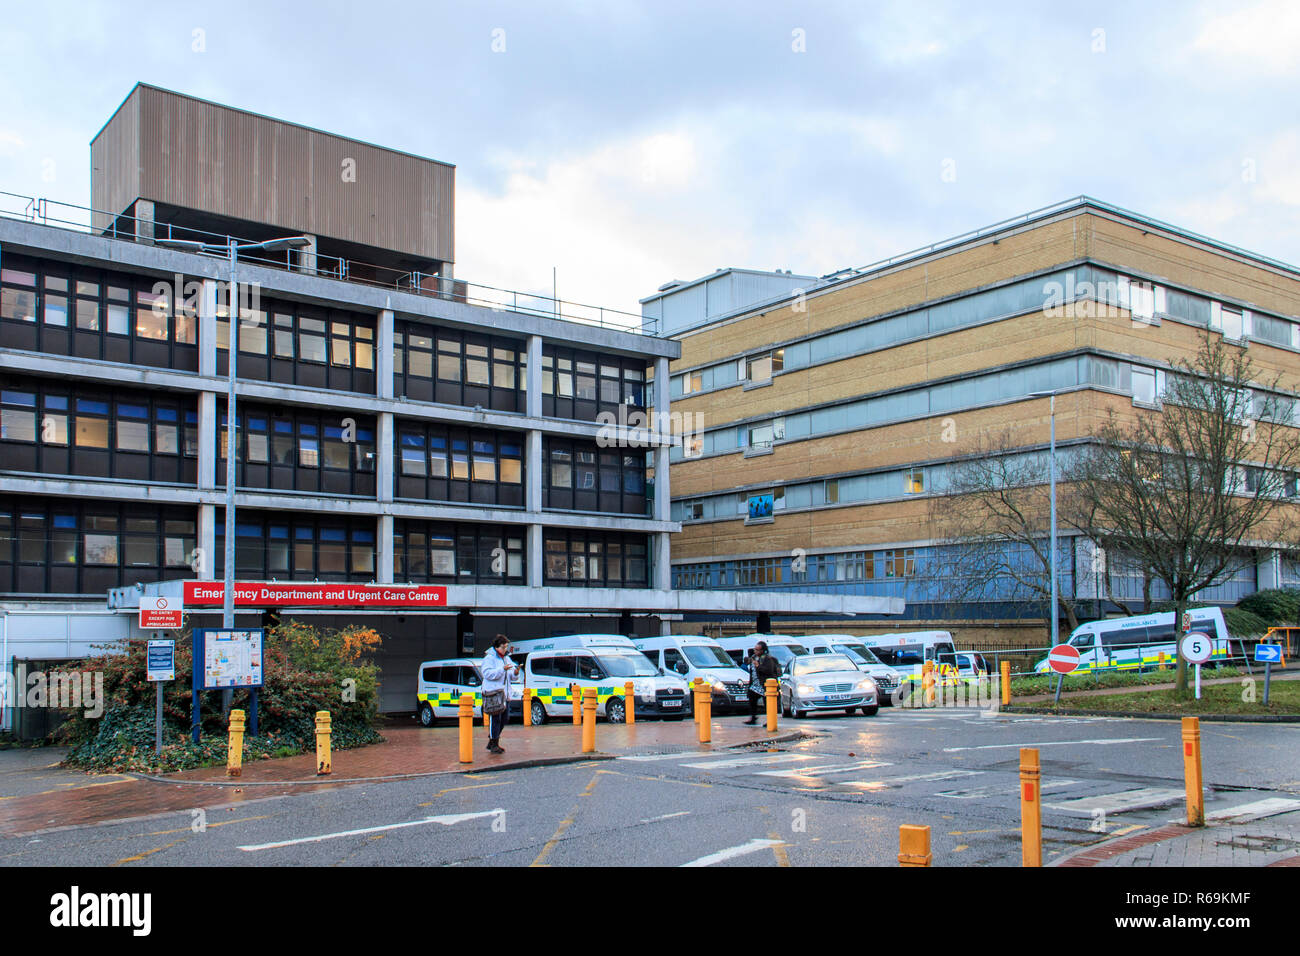 Emergency and Urgent Care departments  of the Whittington Hospital NHS trust on Highgate Hill, London, UK - Stock Image